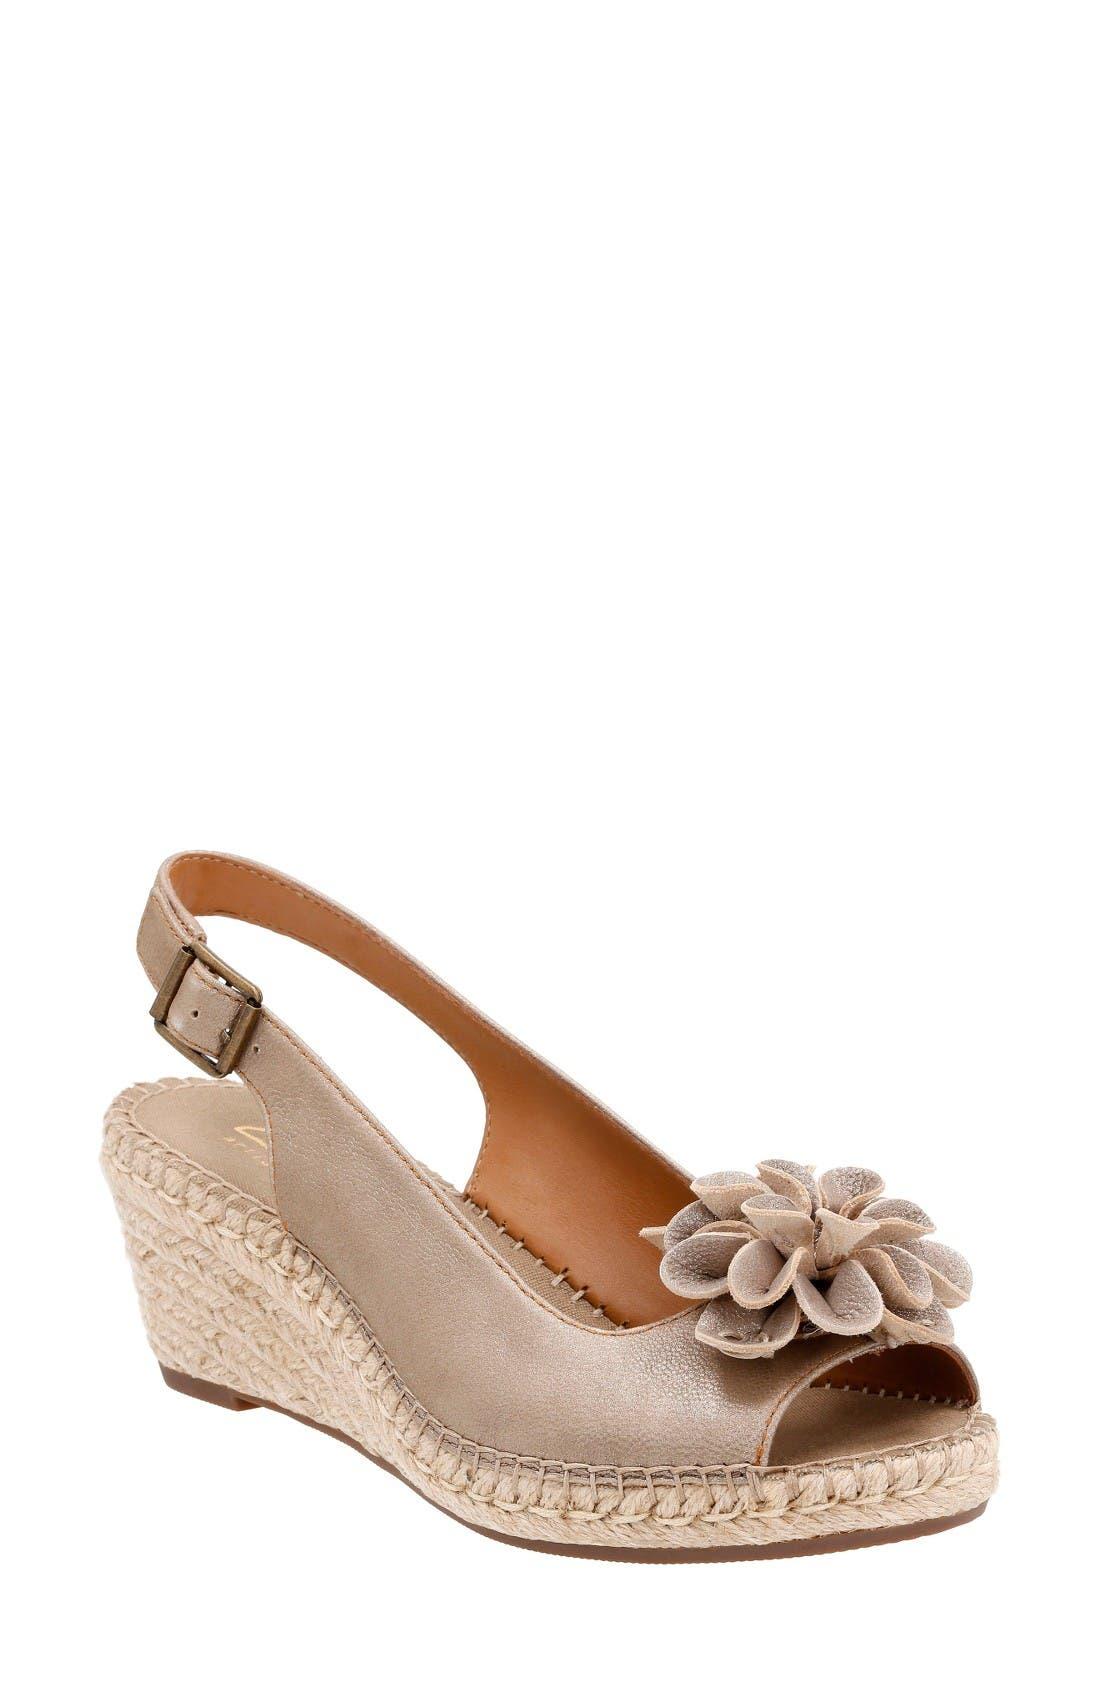 CLARKS<SUP>®</SUP> Petrina Bianca Wedge Sandal